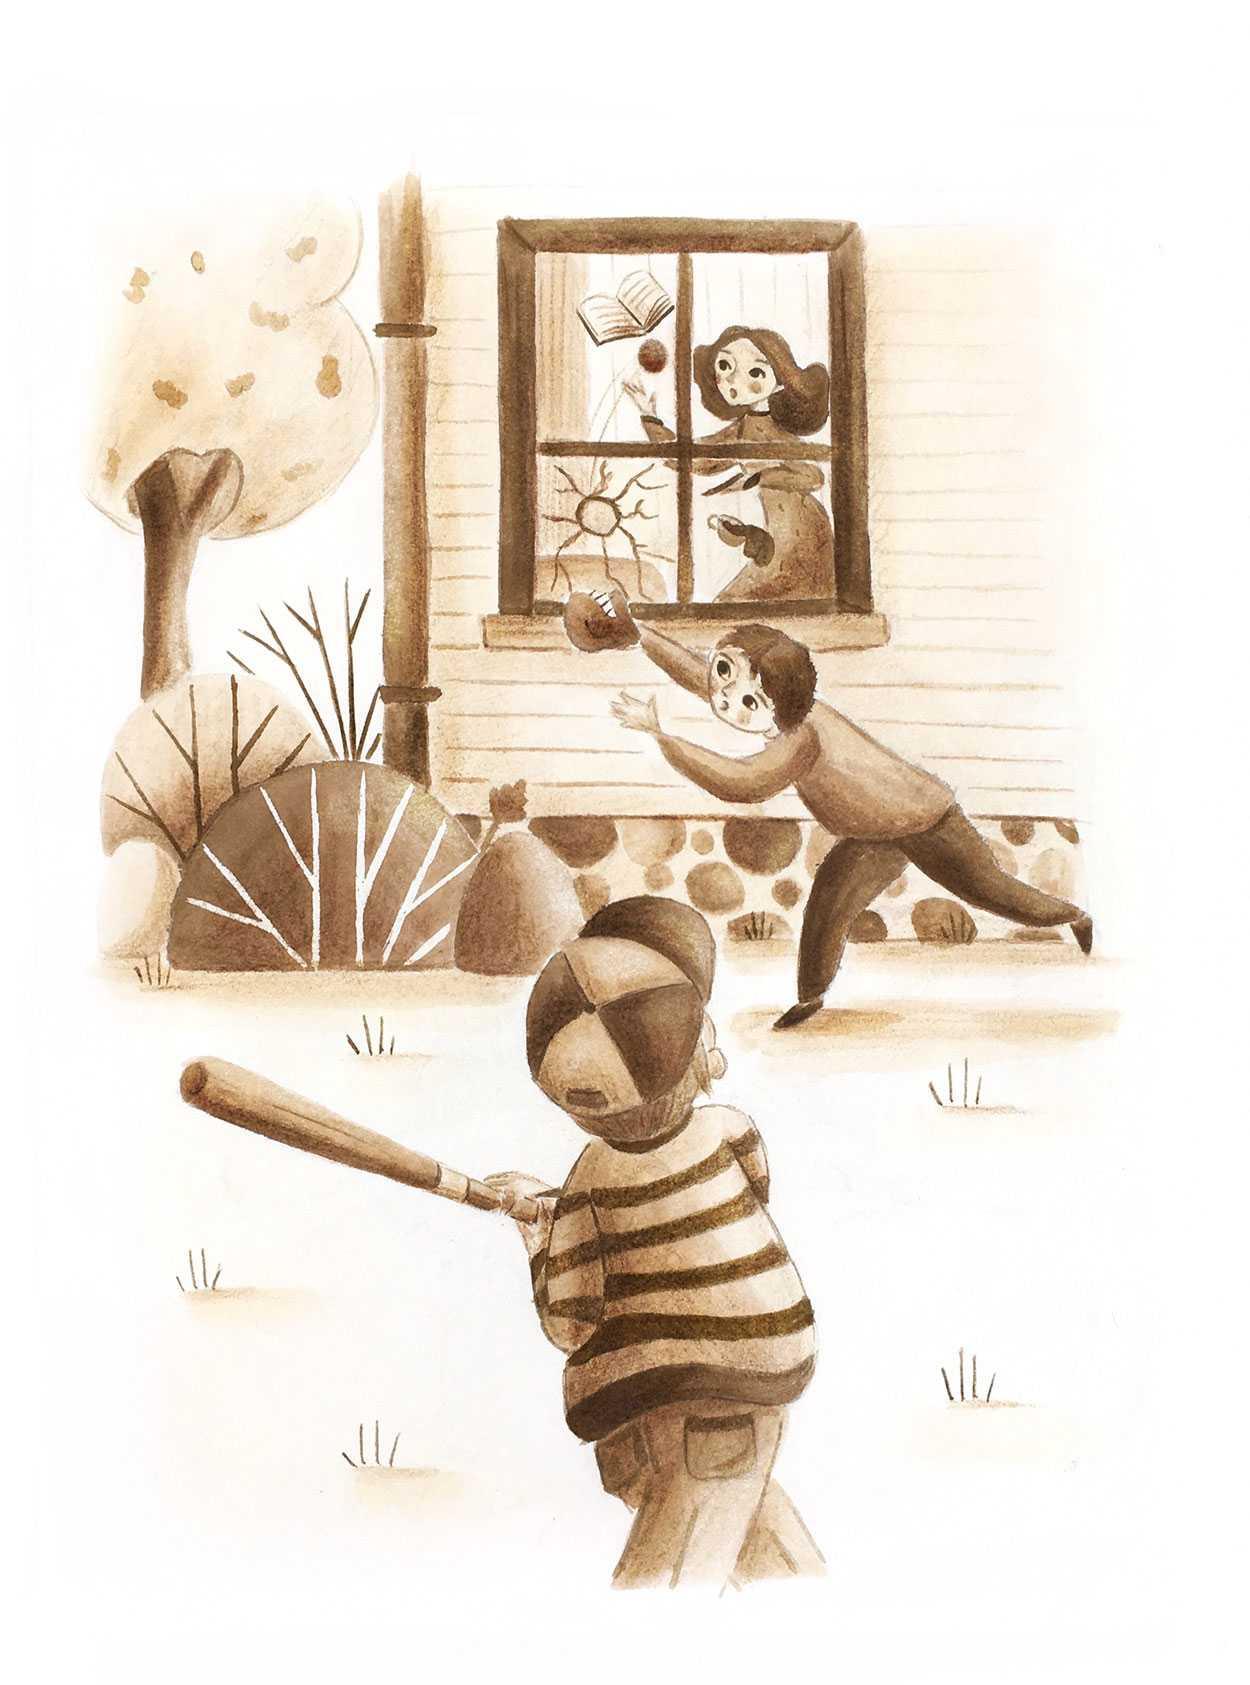 Kids playing baseball and breaking a window